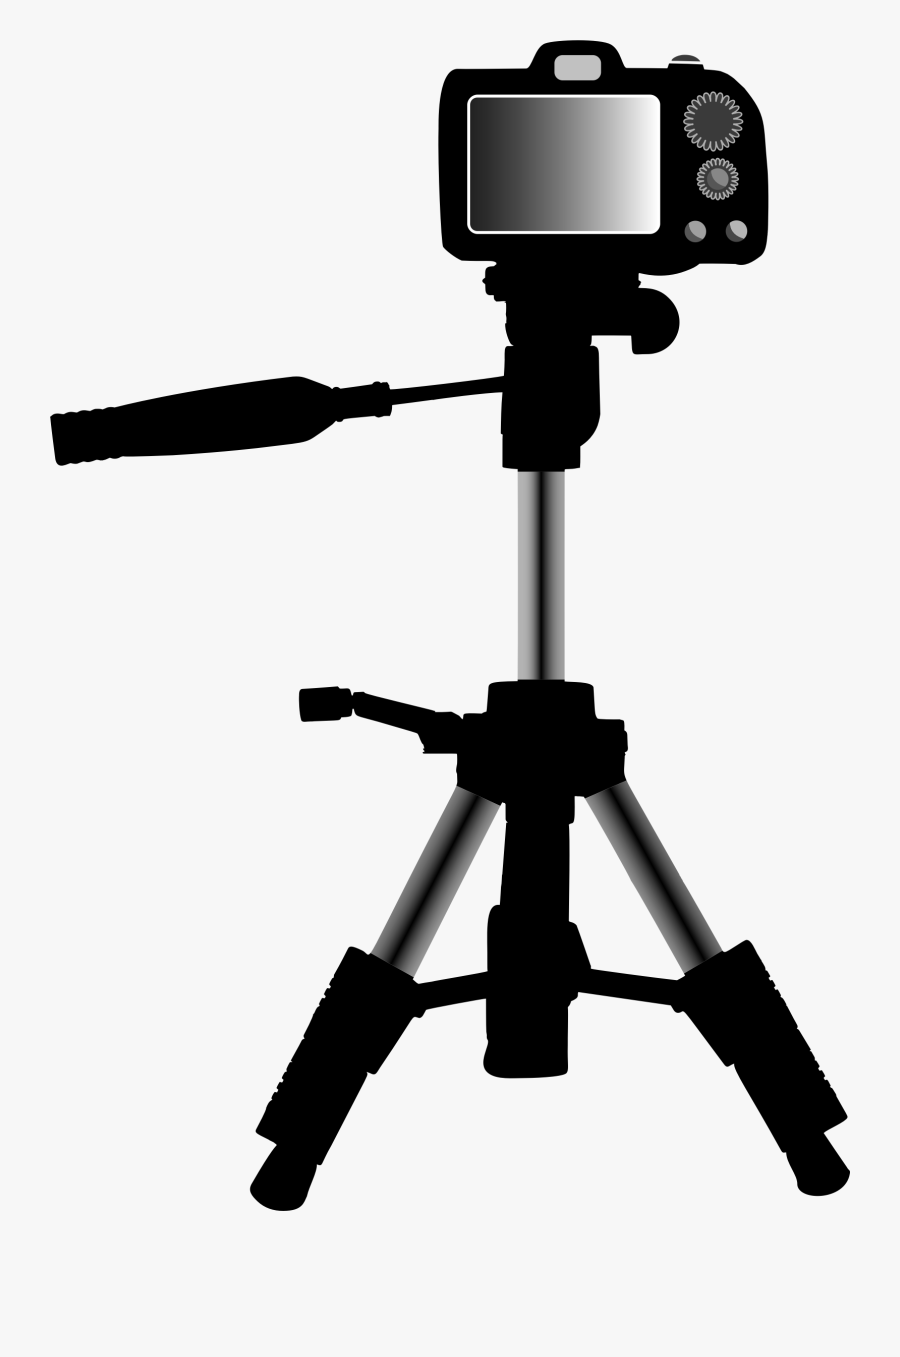 Remix Of Big Image - Camera On Tripod Clipart, Transparent Clipart